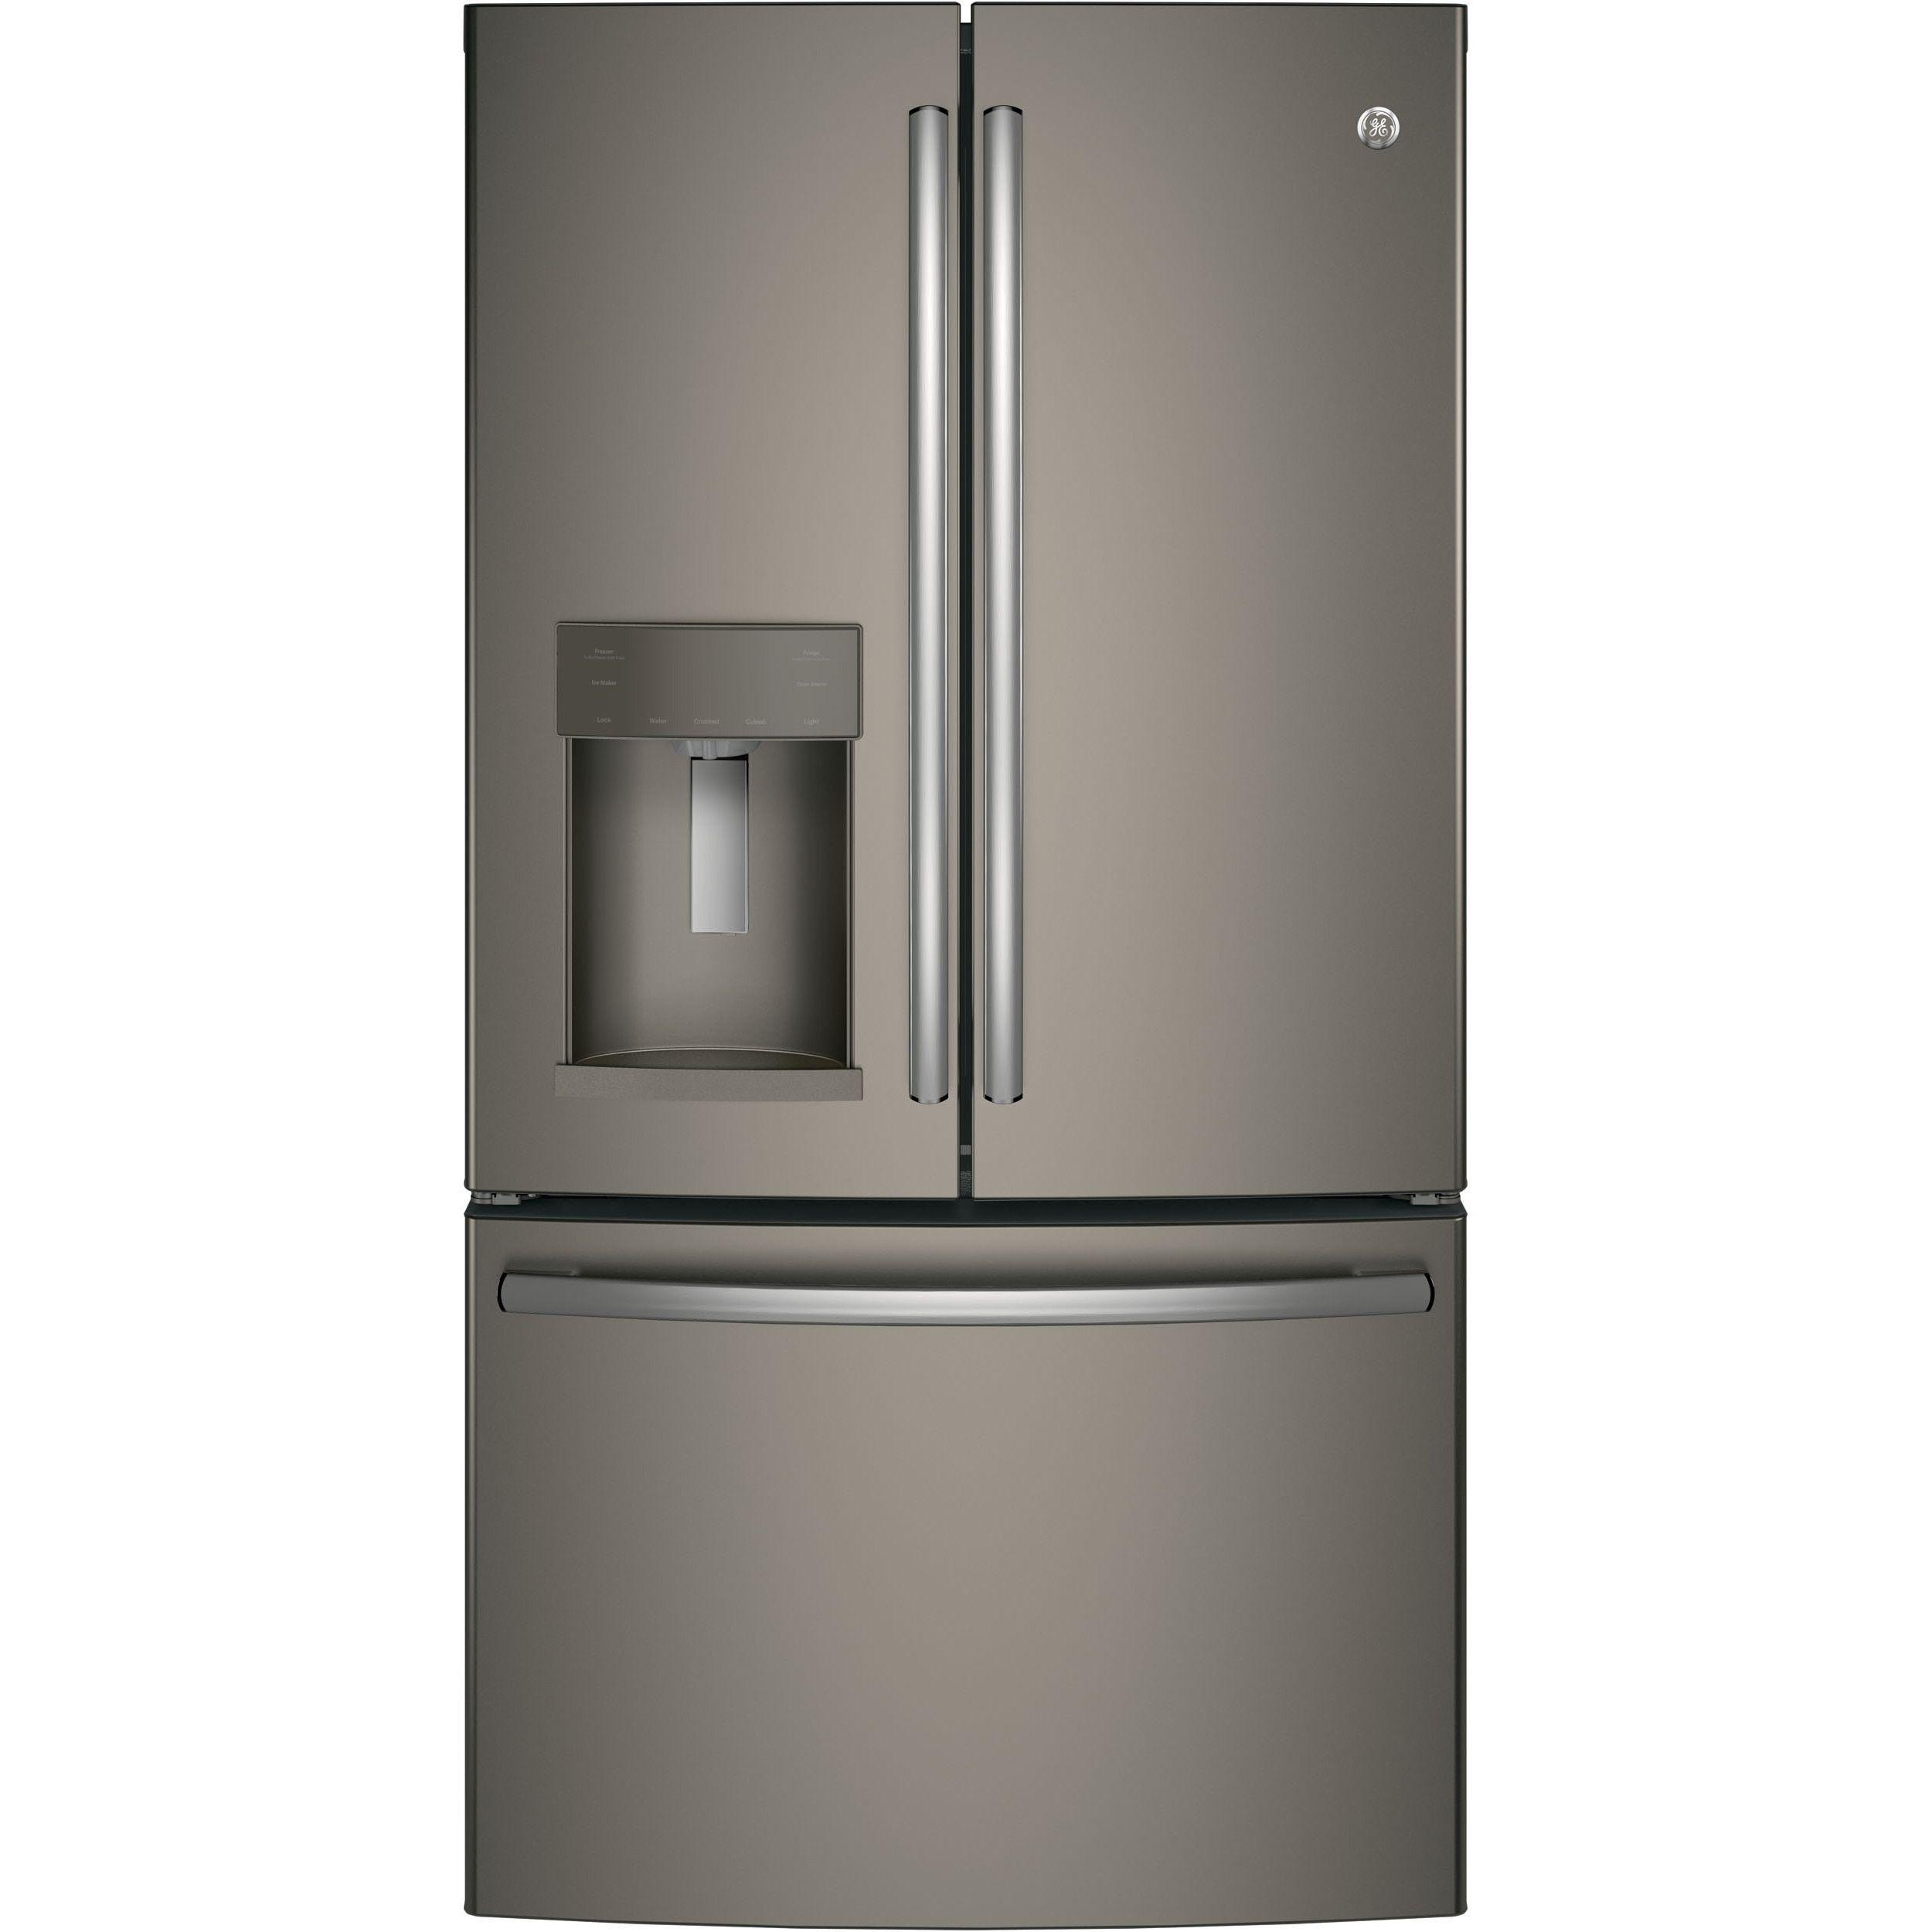 GE Energy Star Slate Grey 27.8 Cubic Foot French-door Refrigerator (Slate)